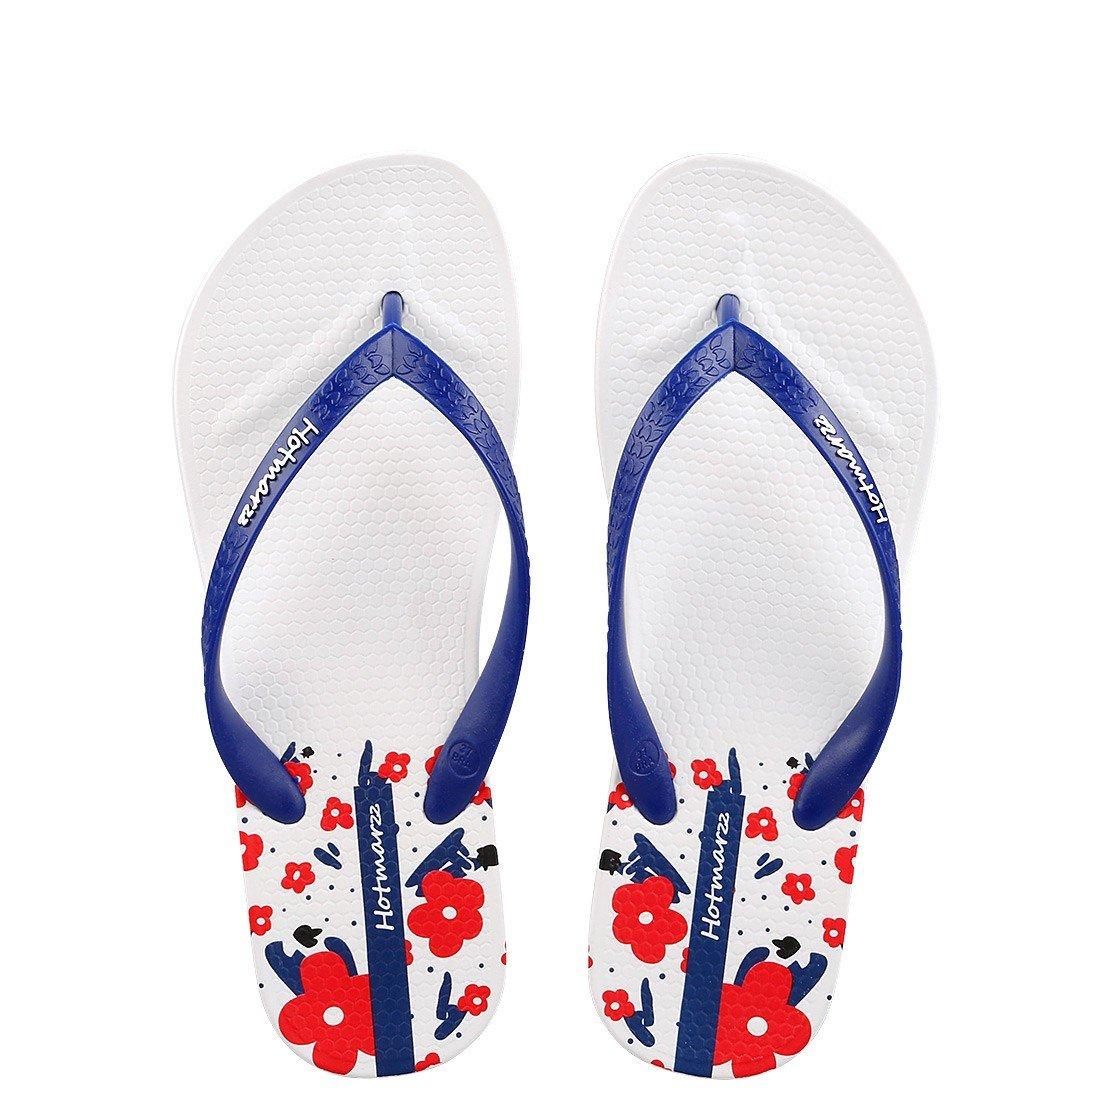 033380974abc Hotmarzz Women s Platform Flip Flops Summer Wedge Sandals Beach Slippers   Amazon.ca  Shoes   Handbags